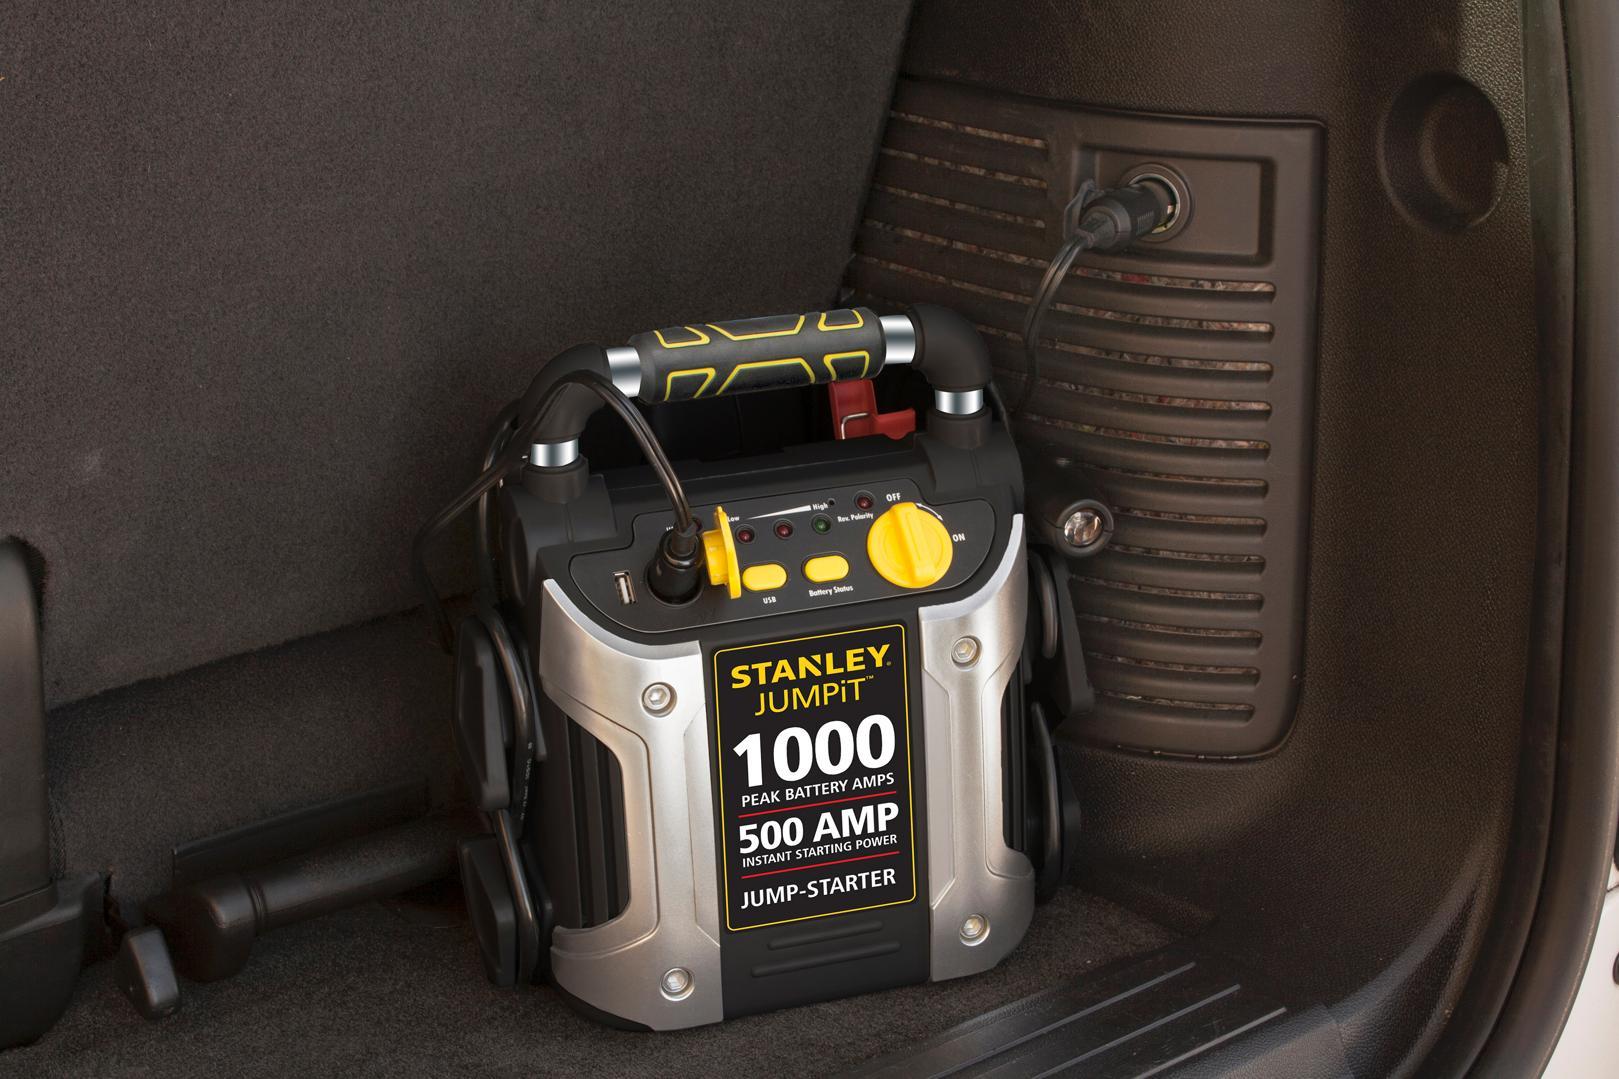 Emergency Battery Jump Starter Portable Air Compressor